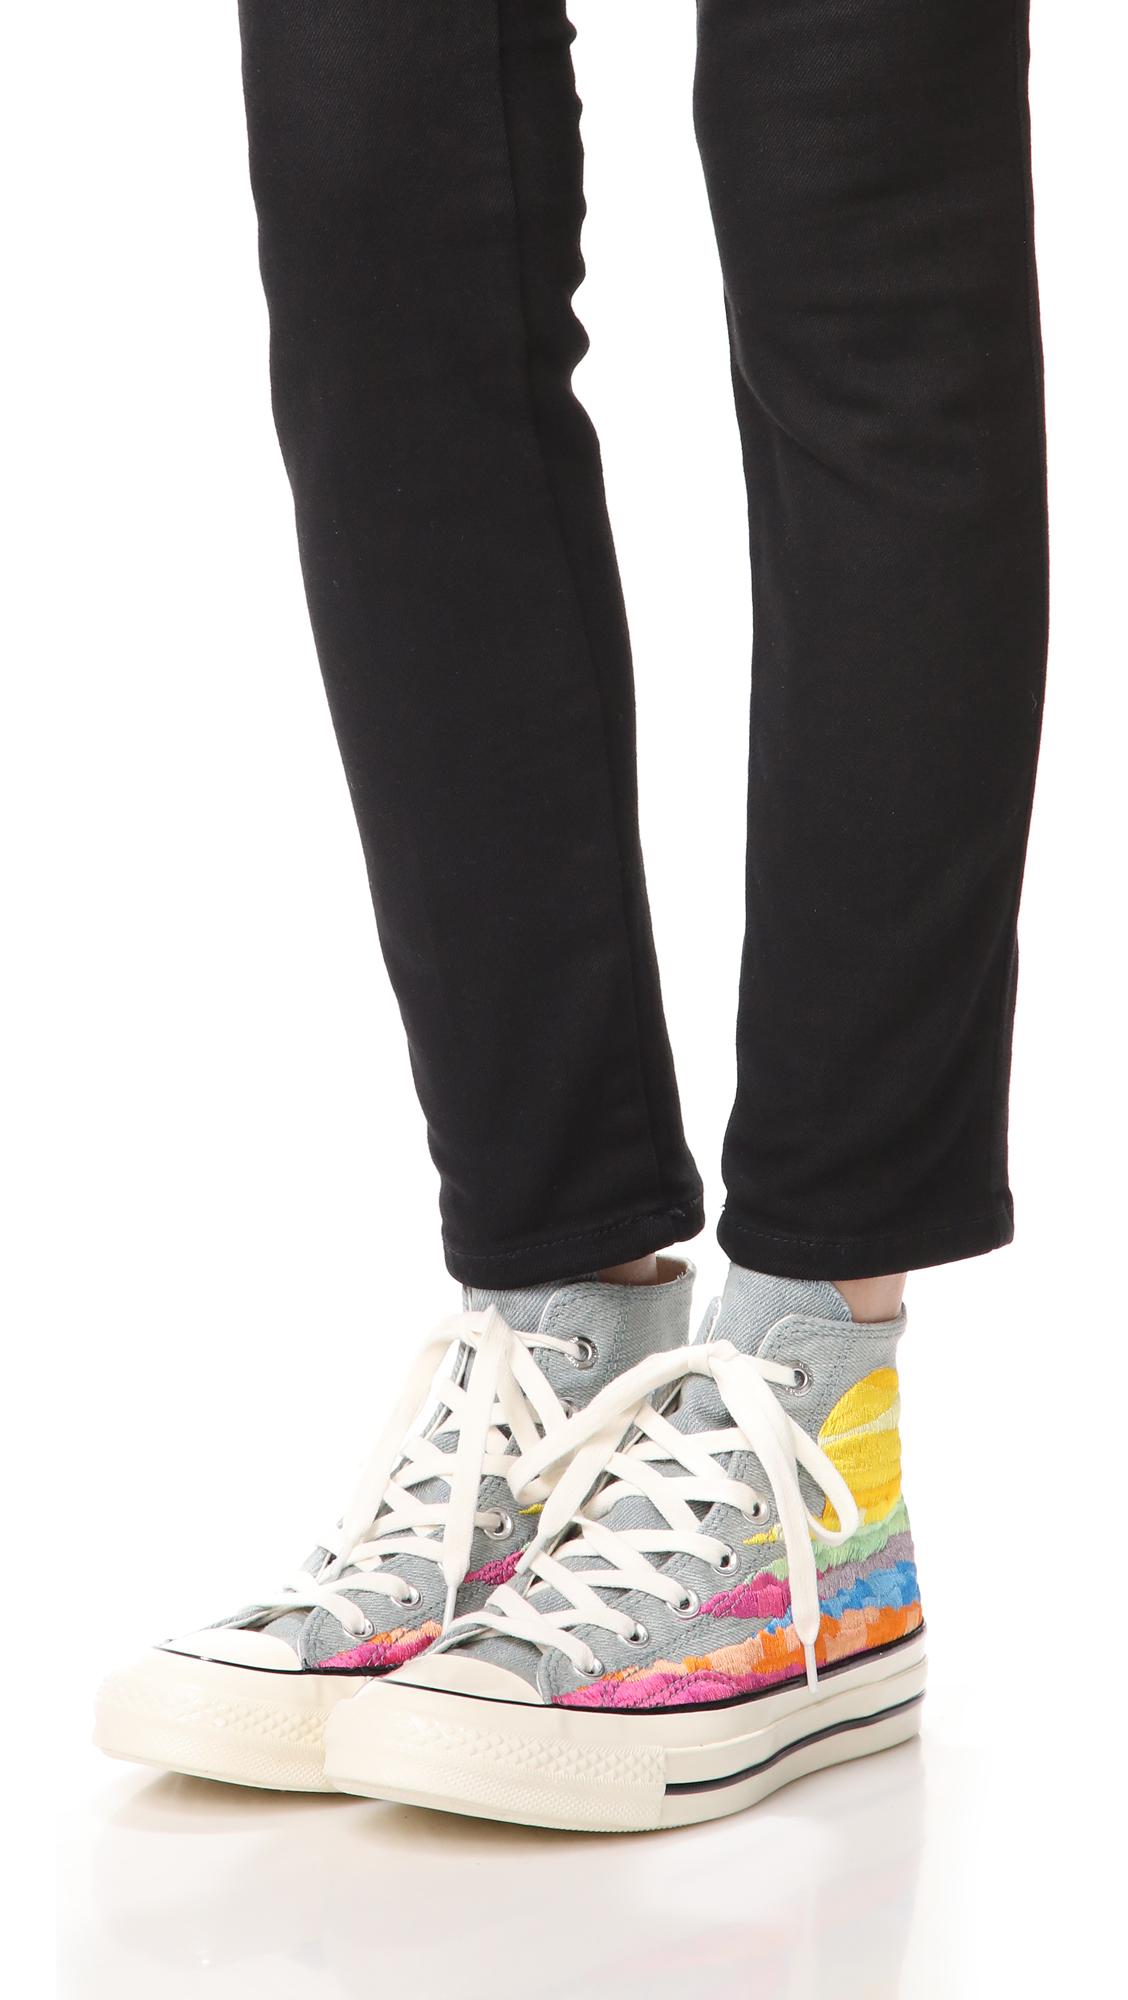 80a89332936426 Converse Chuck Taylor All Star x Mara Hoffman  70s High Top Sneakers ...